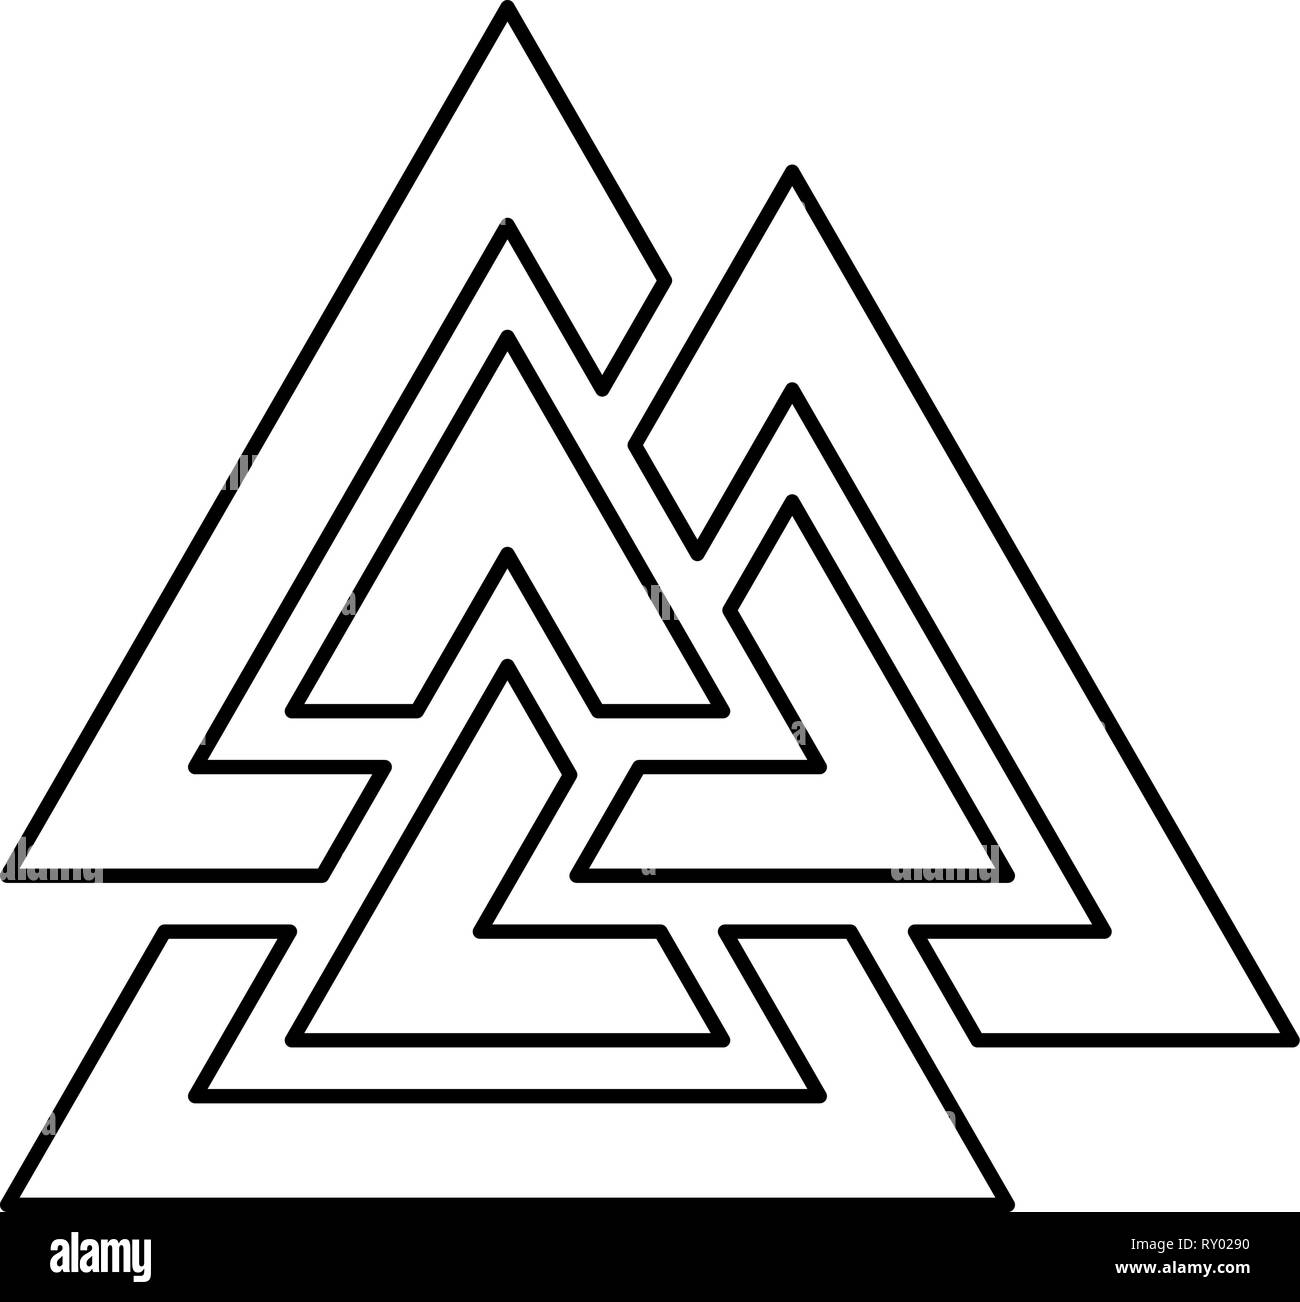 Valknut symbol icon black color outline vector illustration flat style image - Stock Image